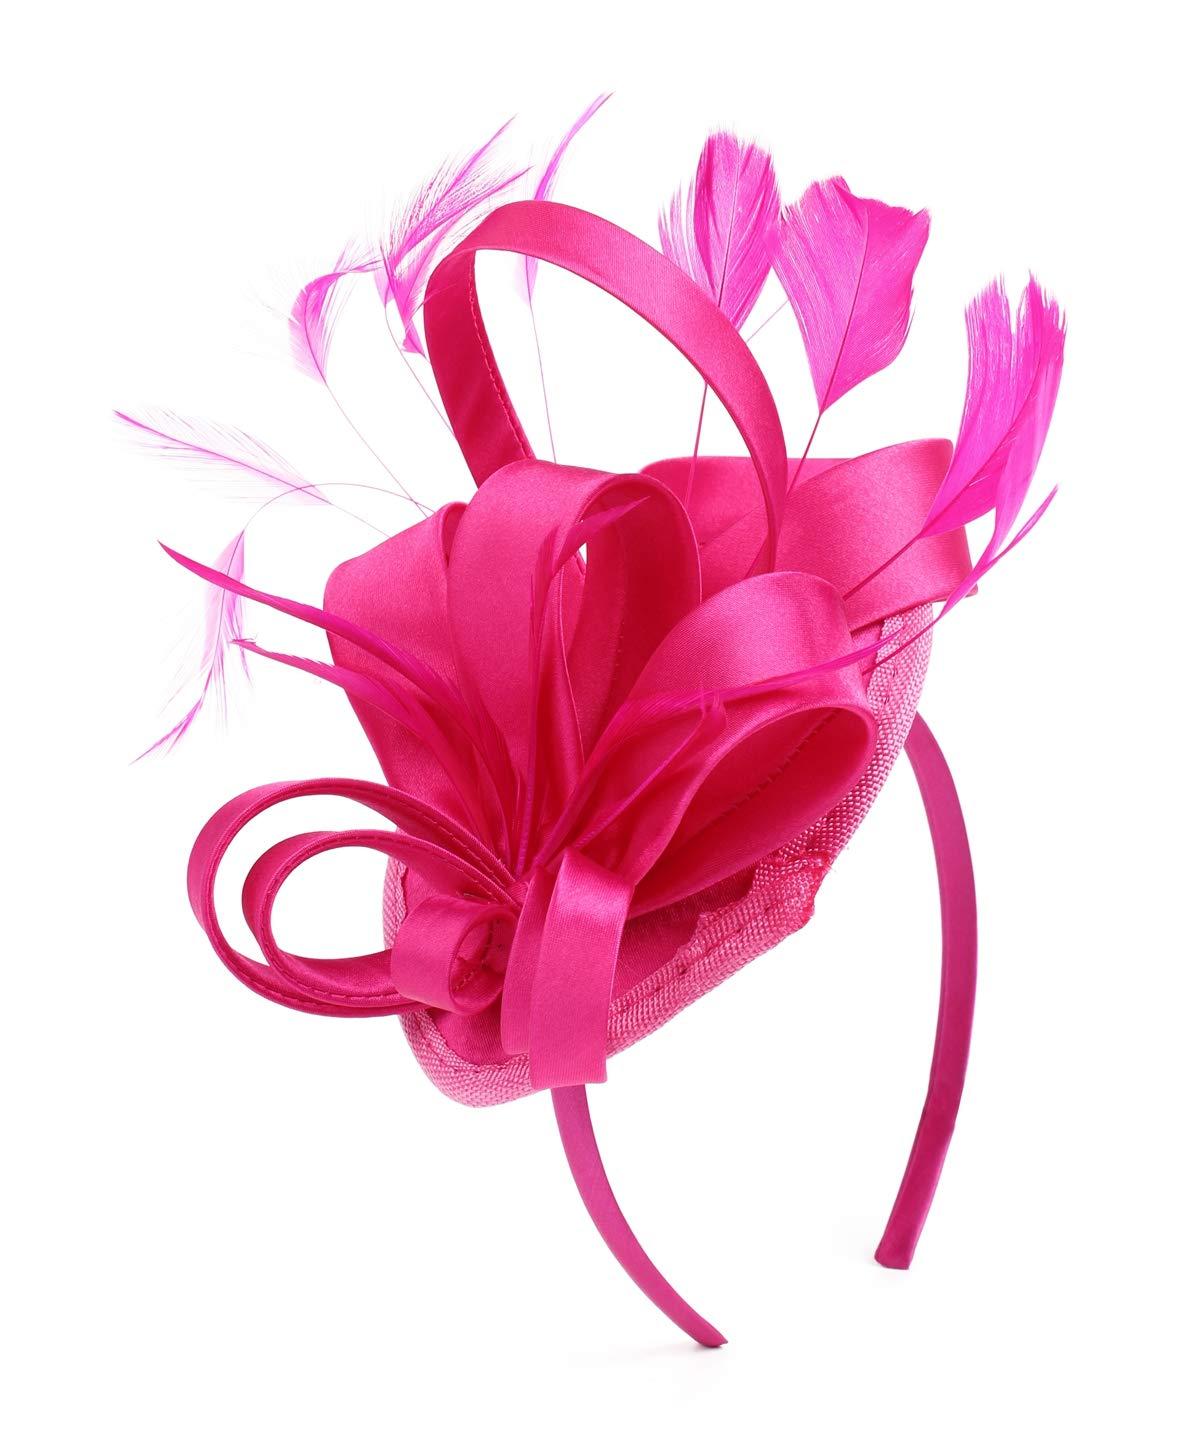 Felizhouse Fascinator Hats for Women Ladies Feather Cocktail Party Hats Bridal Headpieces Kentucky Derby Ascot Fascinator Headband (#1 Satin Fuchsia)